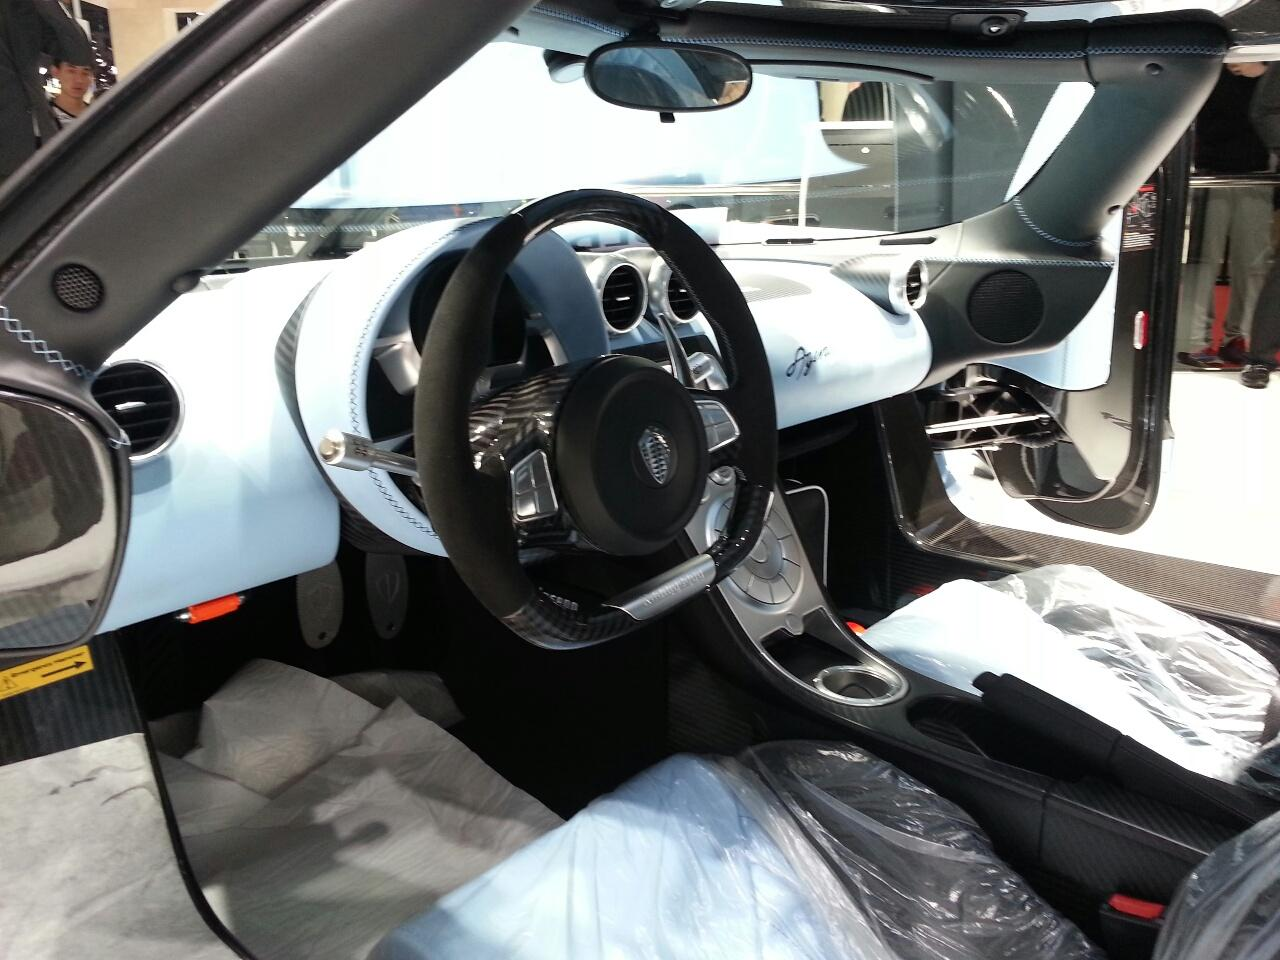 Koenigsegg koenigsegg agera r interior : 100+ [ Koenigsegg Car Interior ] | Released Stargt 2011 Koenigsegg ...